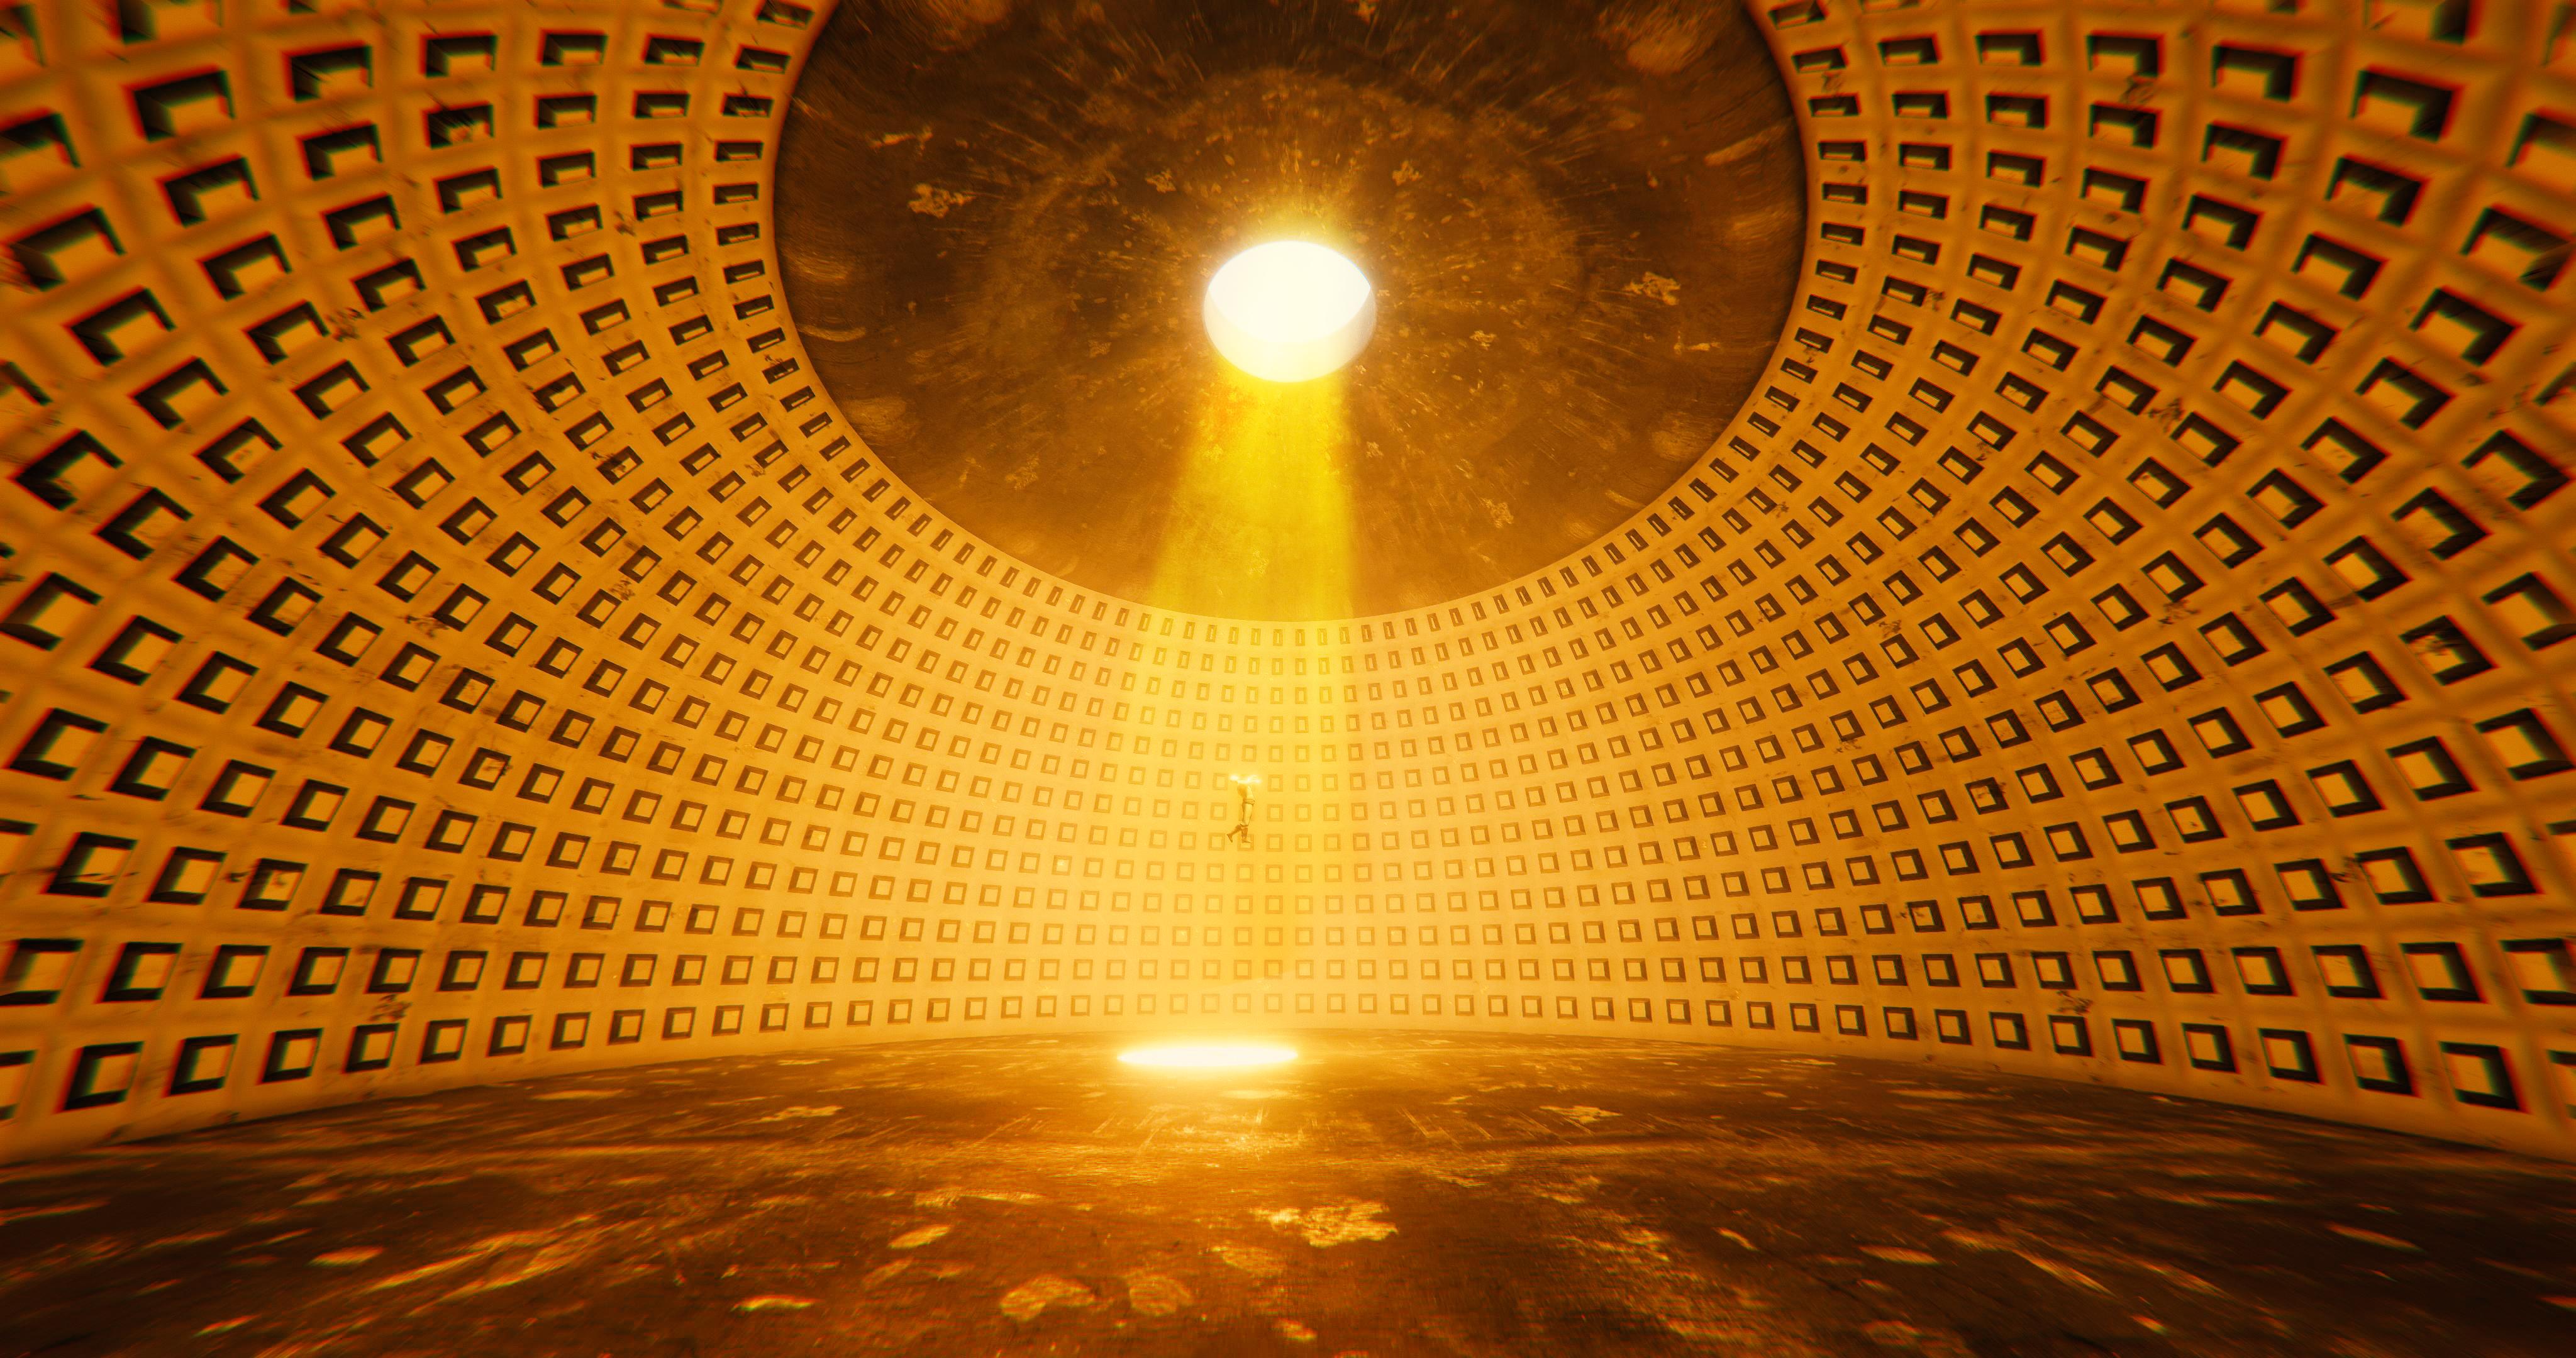 Dome - Ascending